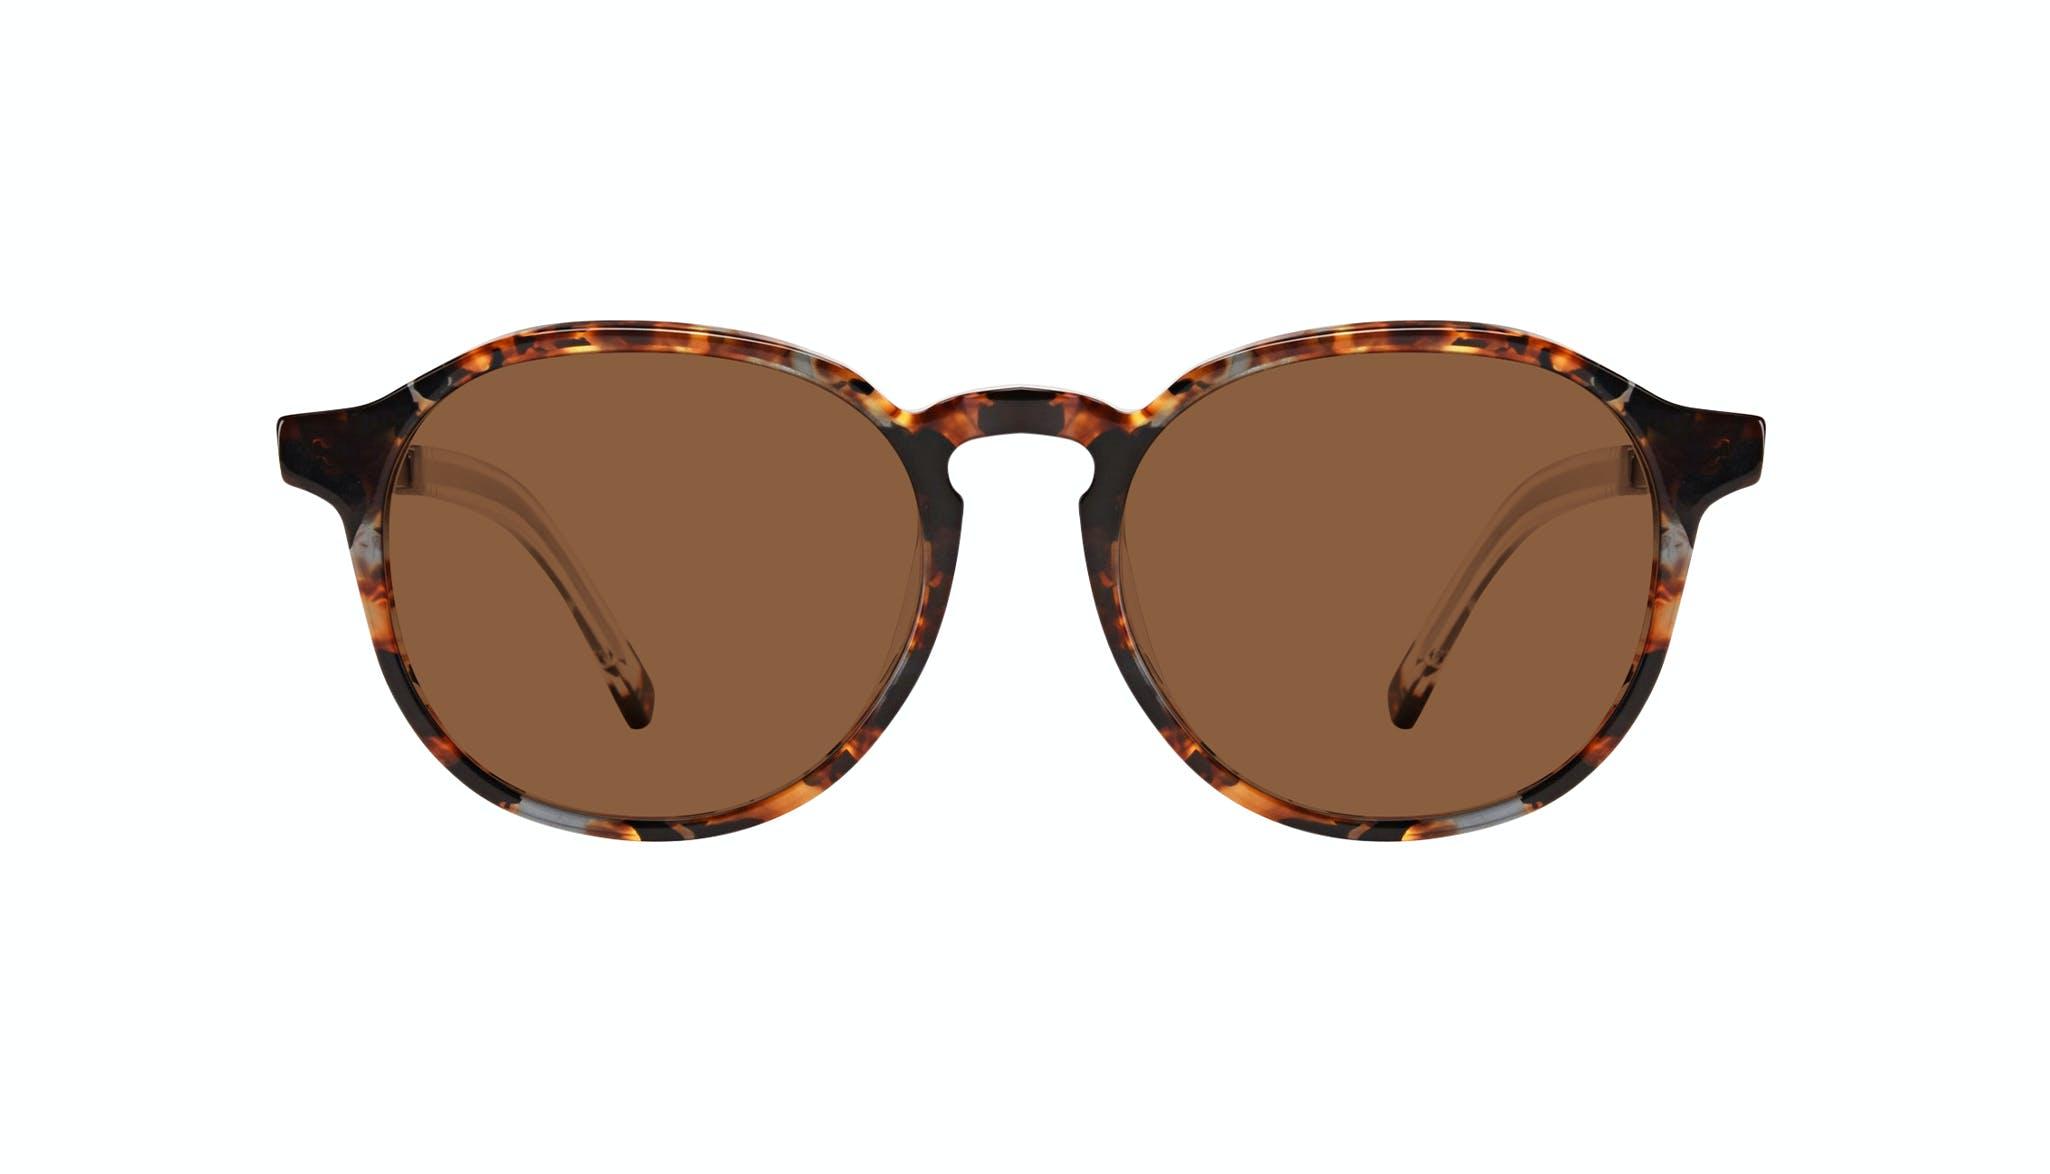 Affordable Fashion Glasses Round Sunglasses Men Prime XL Mahogany Front